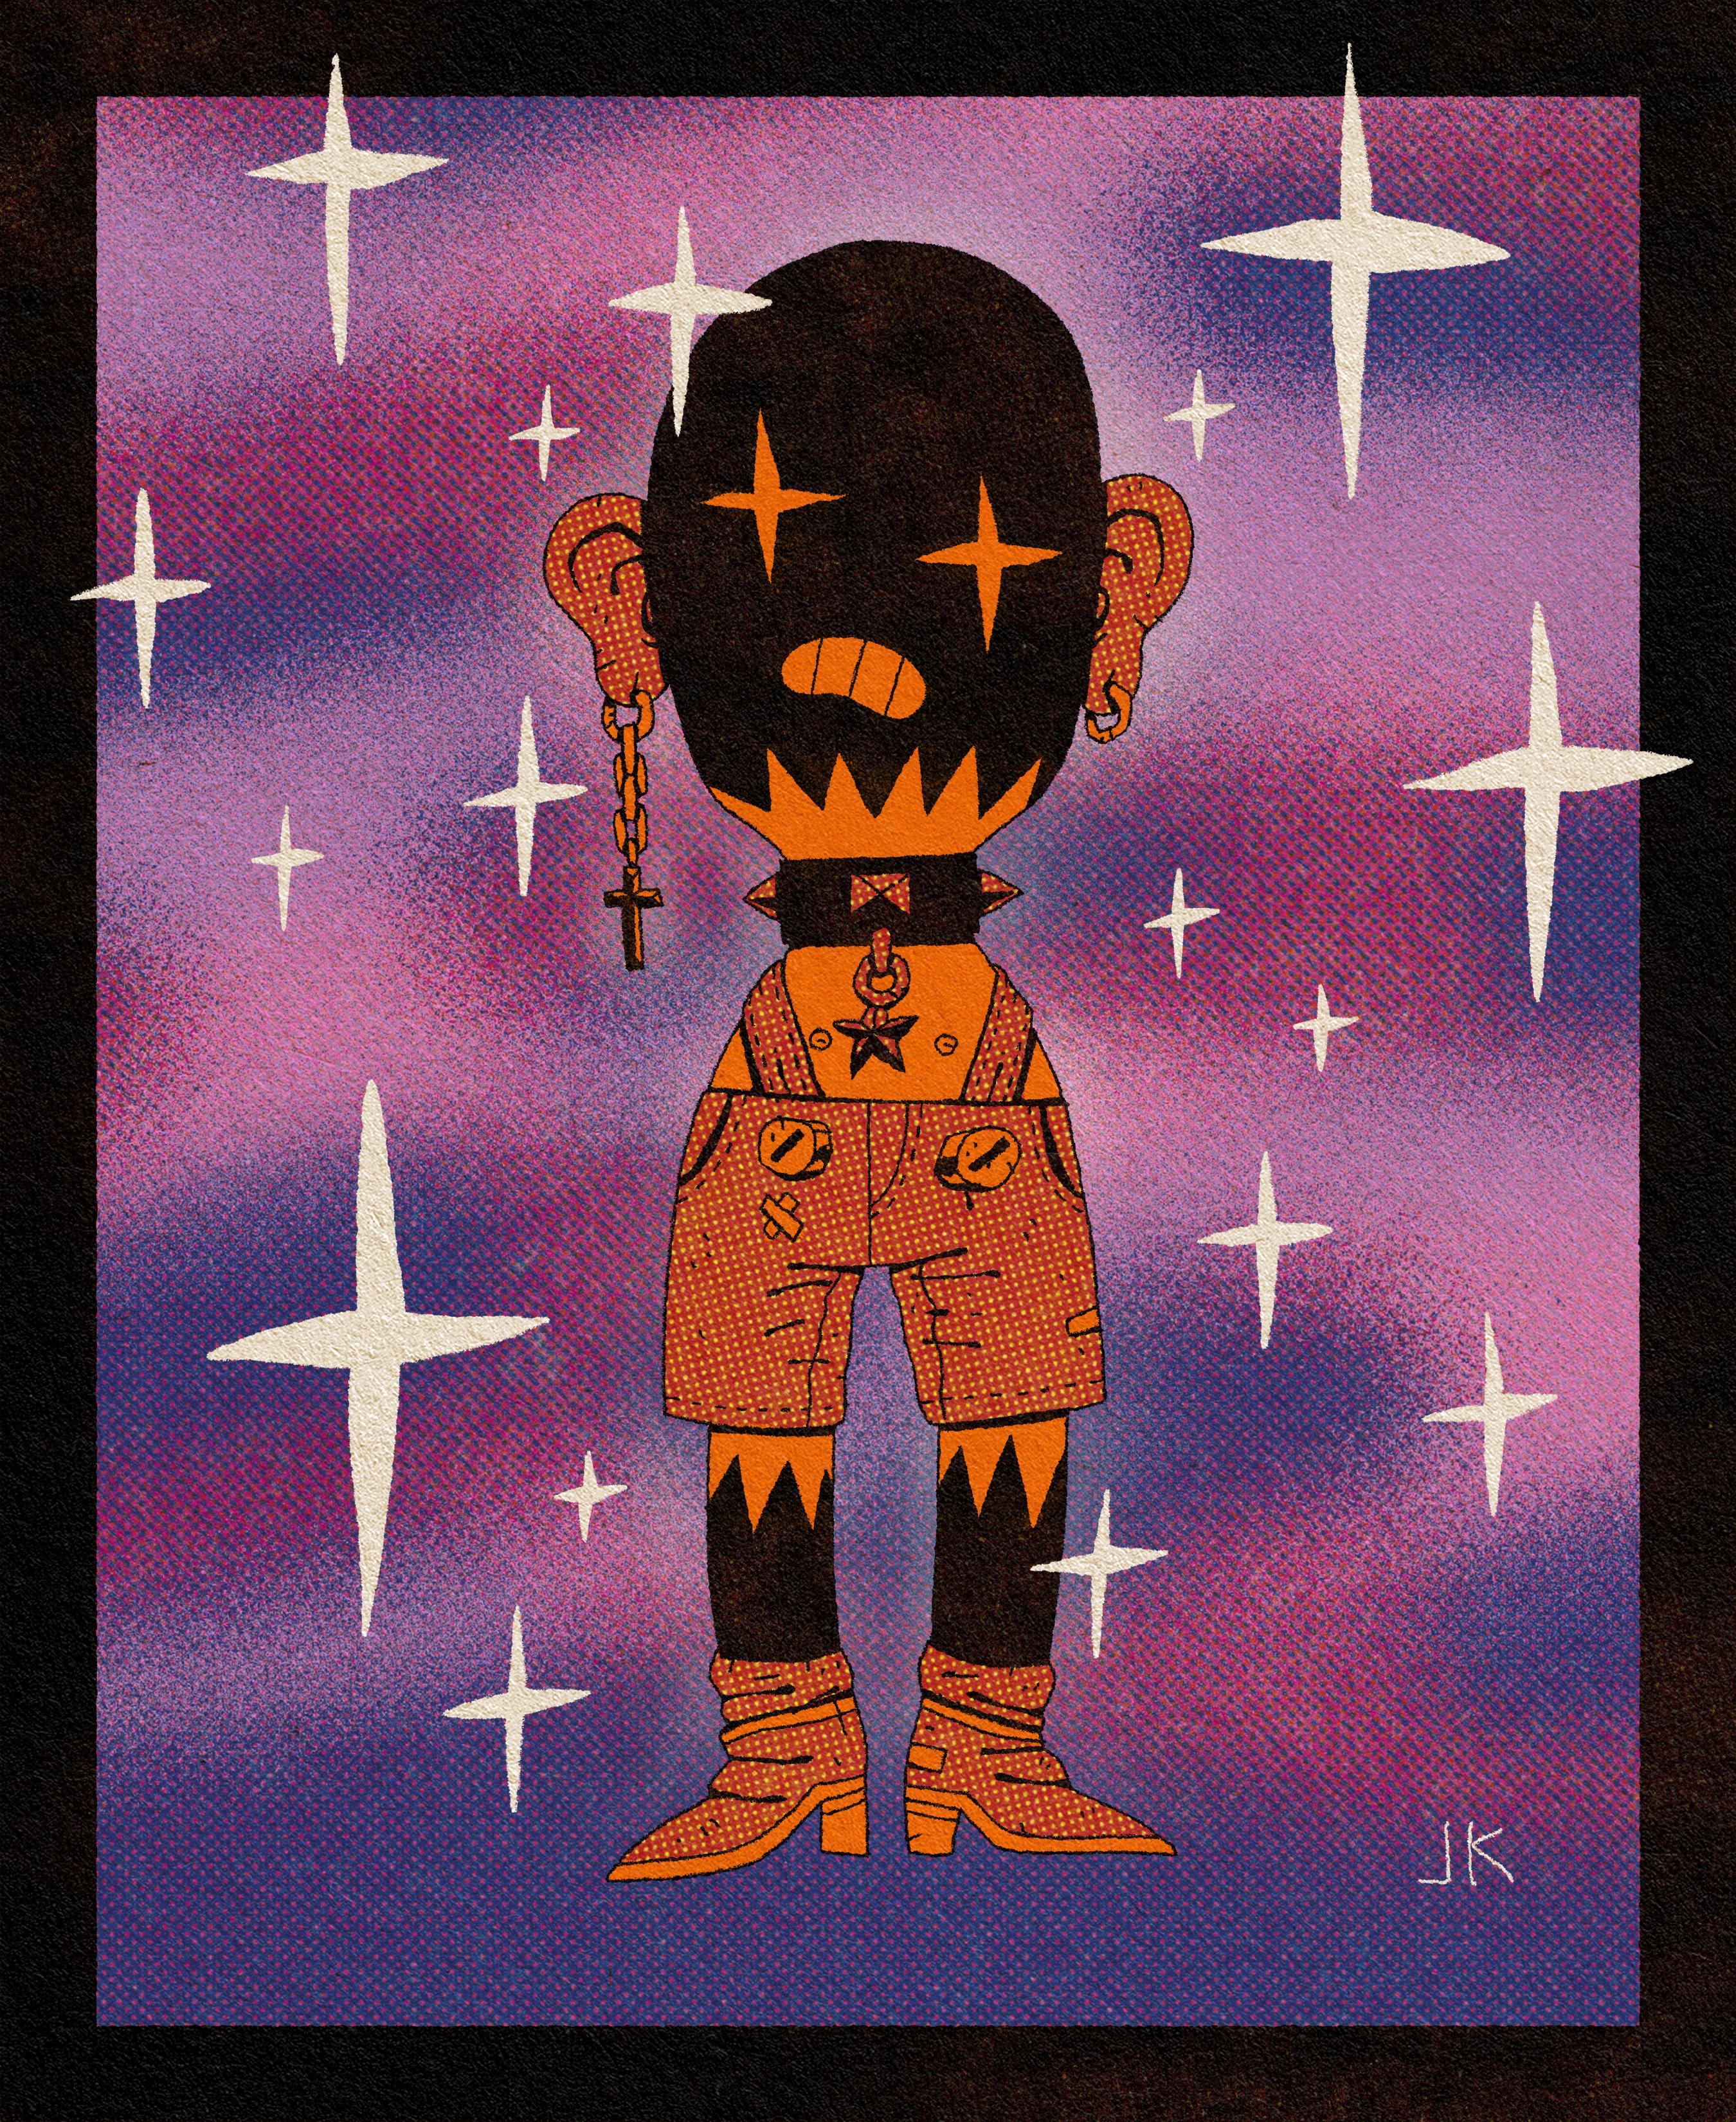 THE FRESNO NIGHTCRAWLER